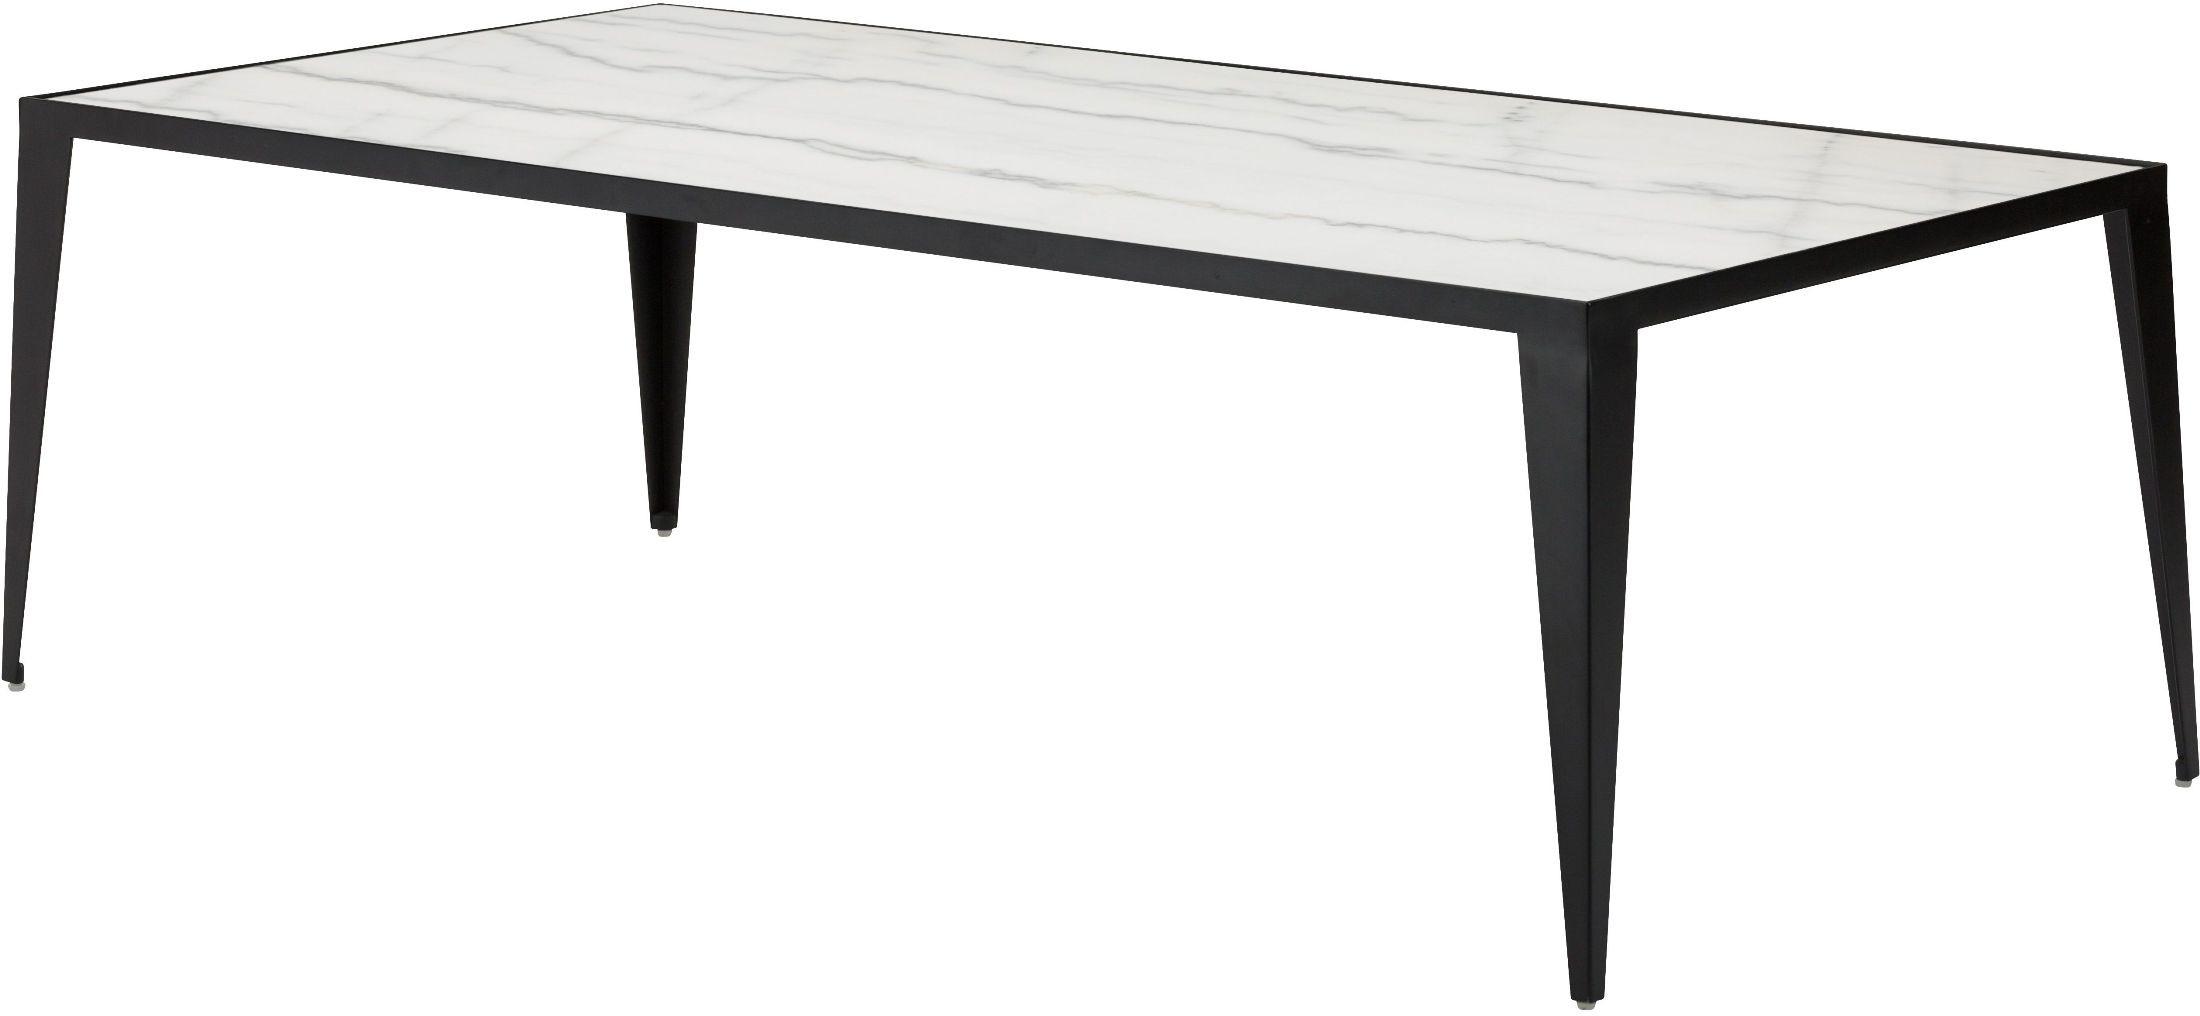 Mink White Stone Coffee Table Hgna136 Nuevo